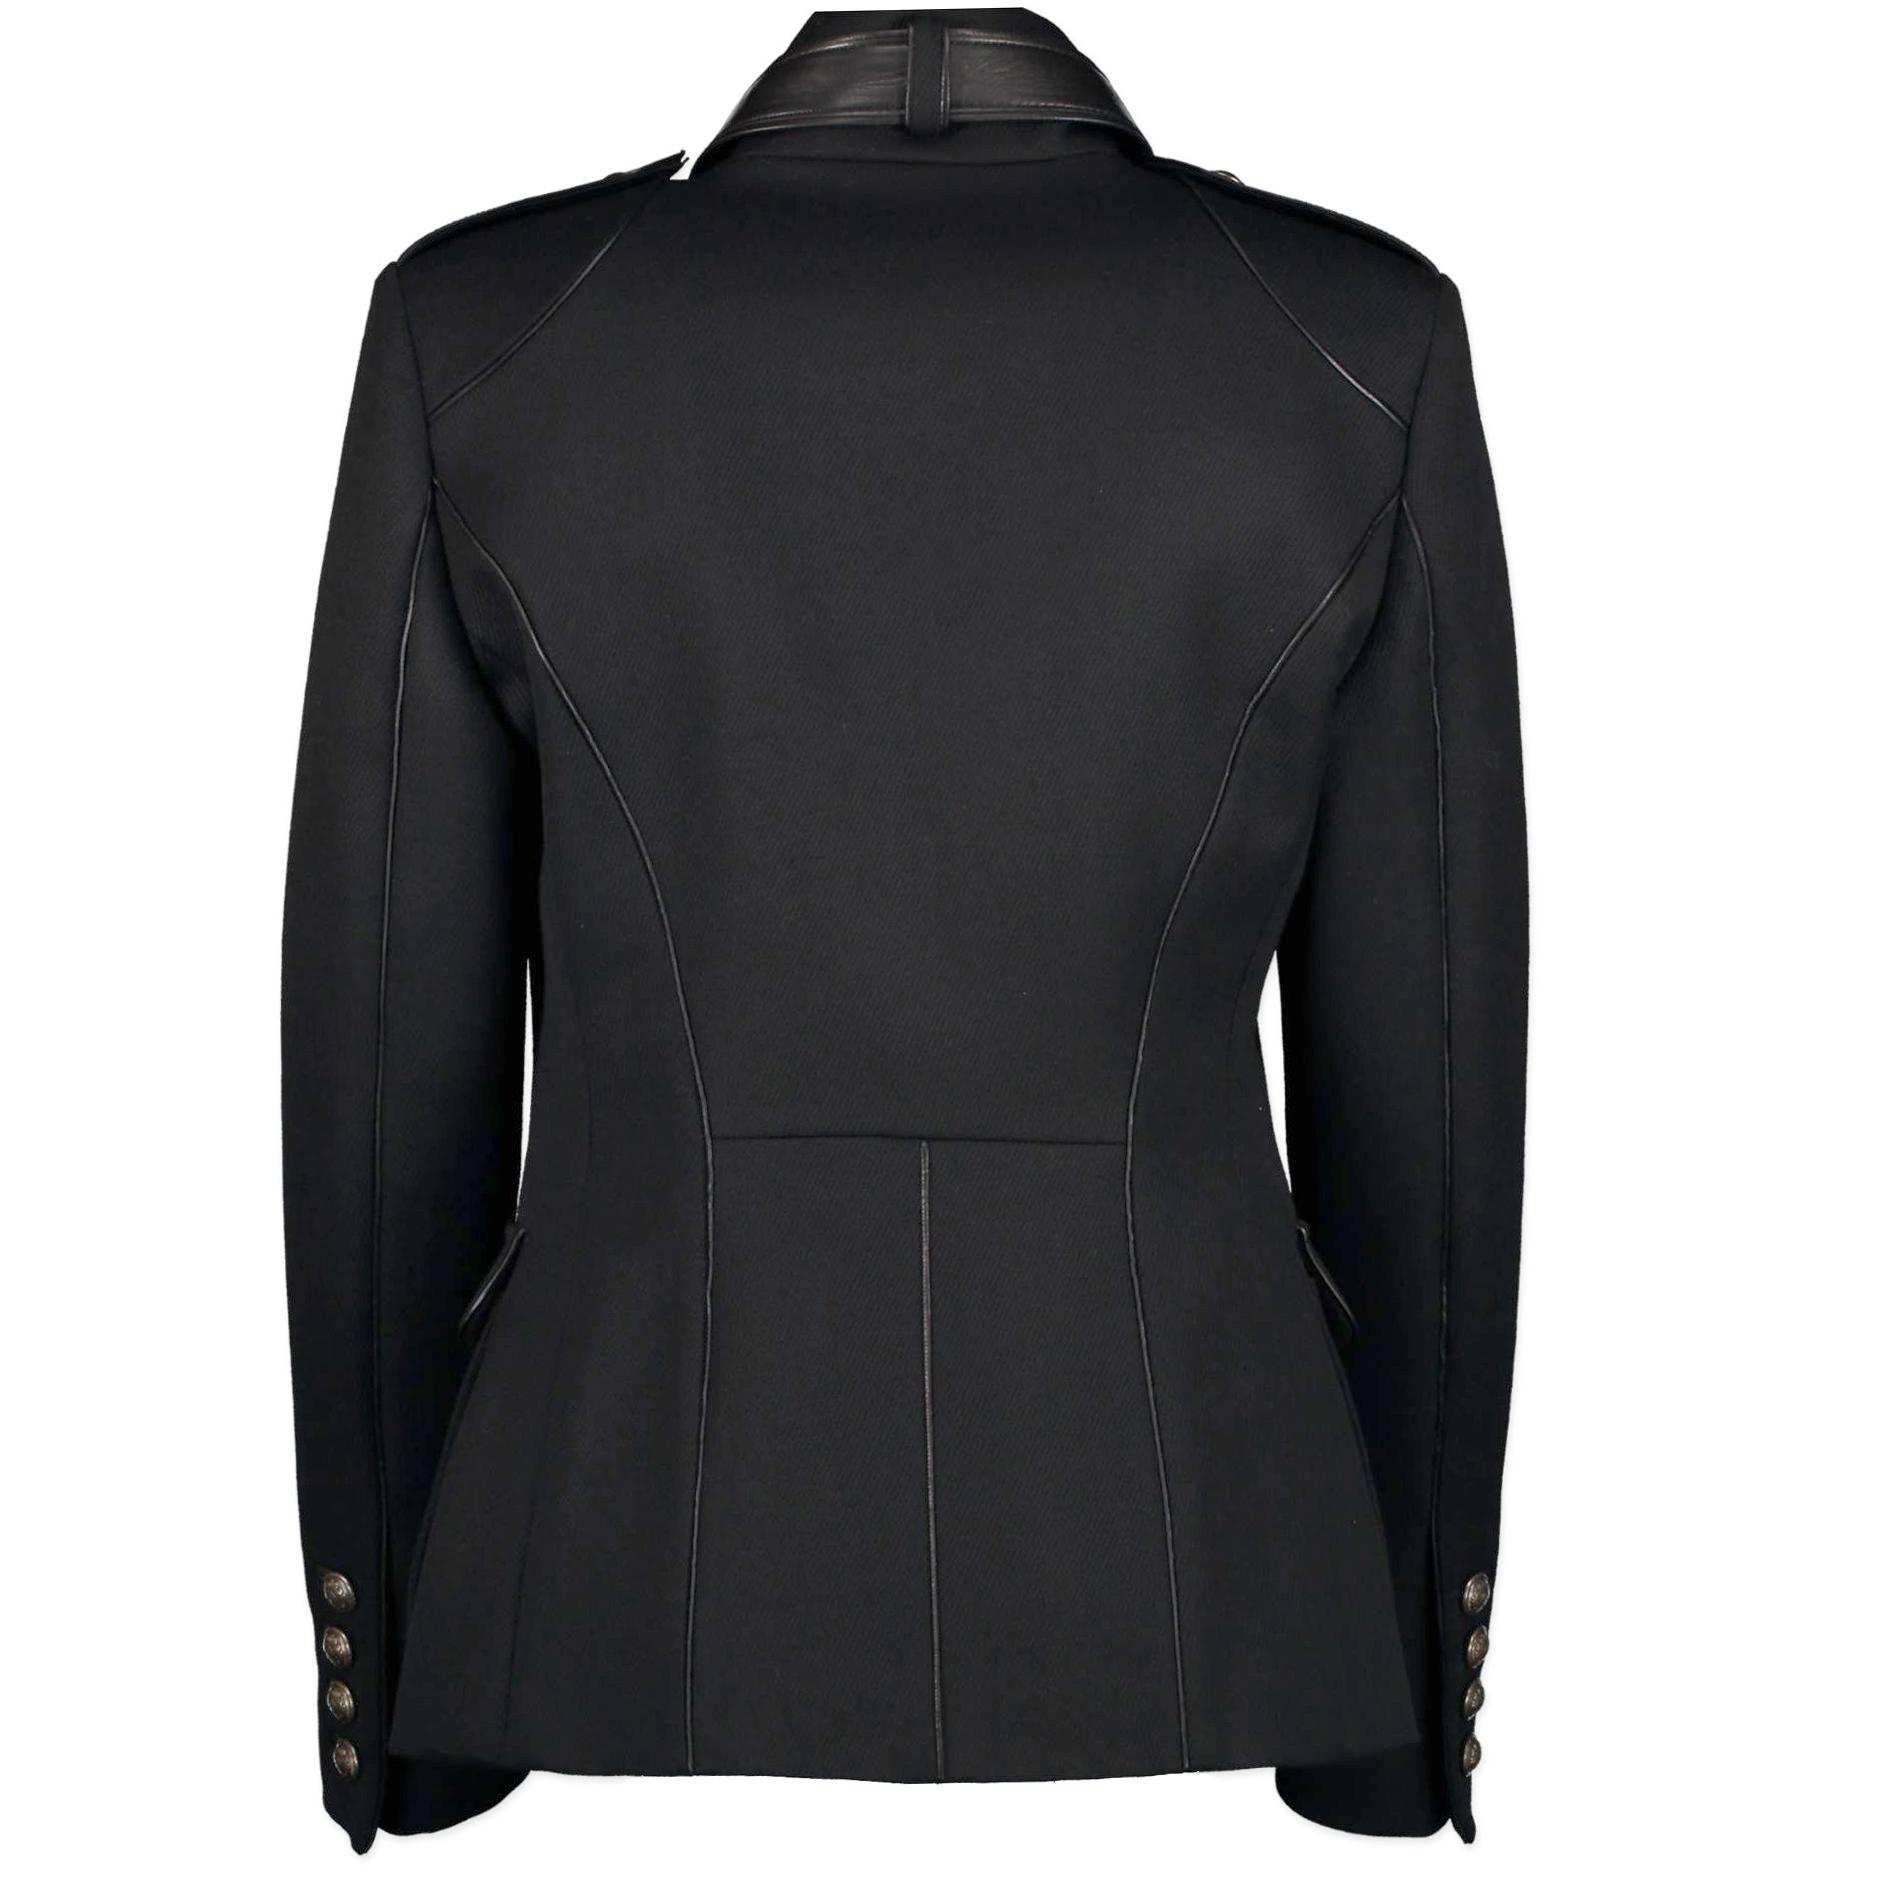 Roberto Cavalli Black Wool Military jacket - Size IT 42